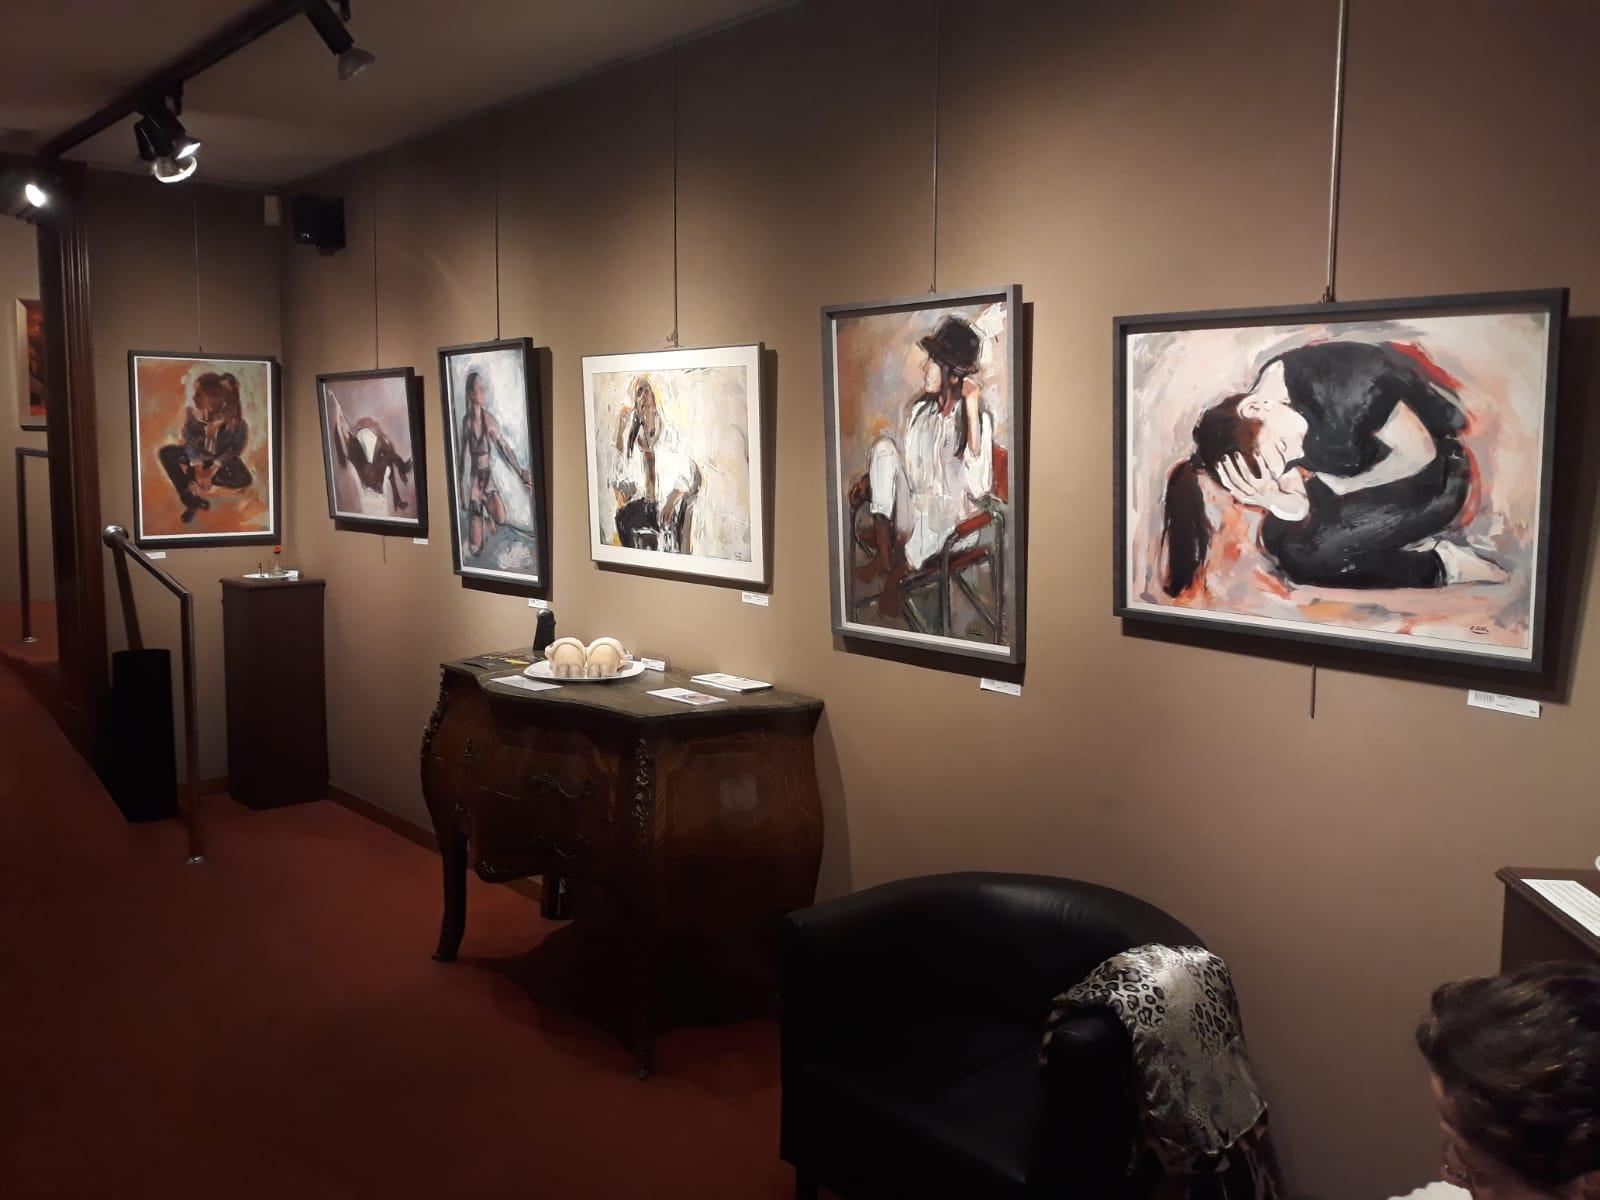 http://esteveprat.cat/wp-content/uploads/04-galeria-art-mar-bcn-grup-art-escola-2019.jpg